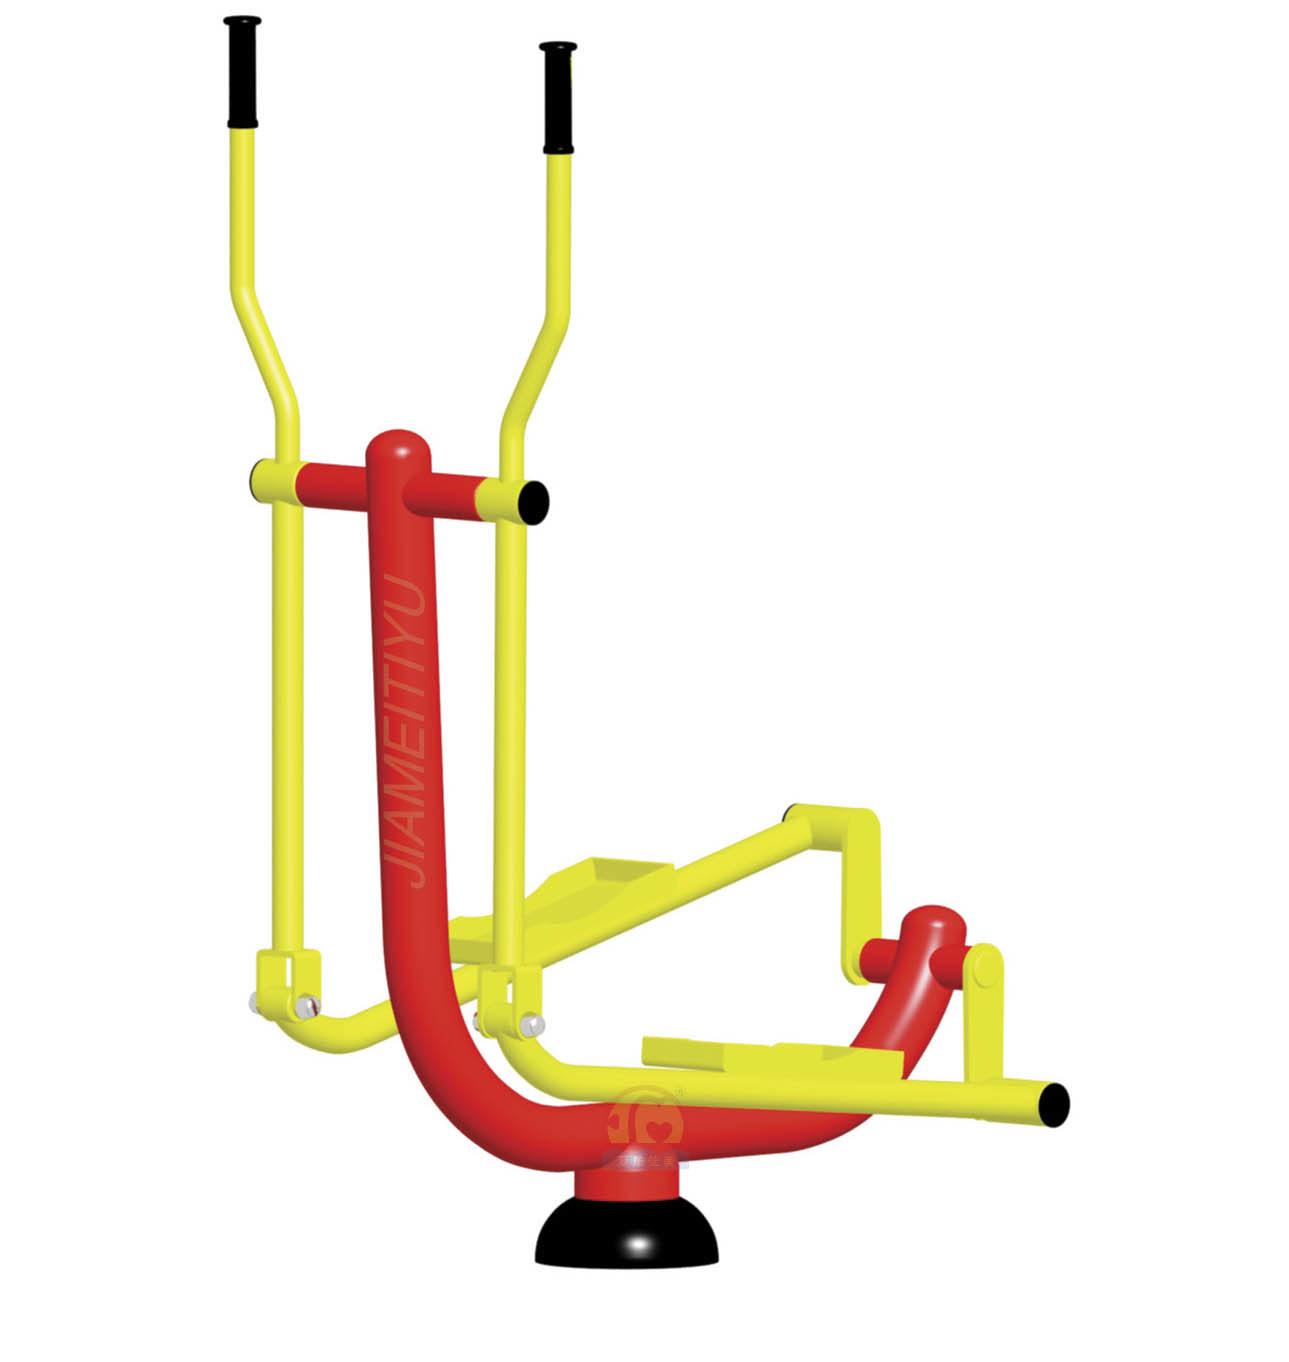 Nscc Elliptical Trainer Outdoor Fitness Equipment